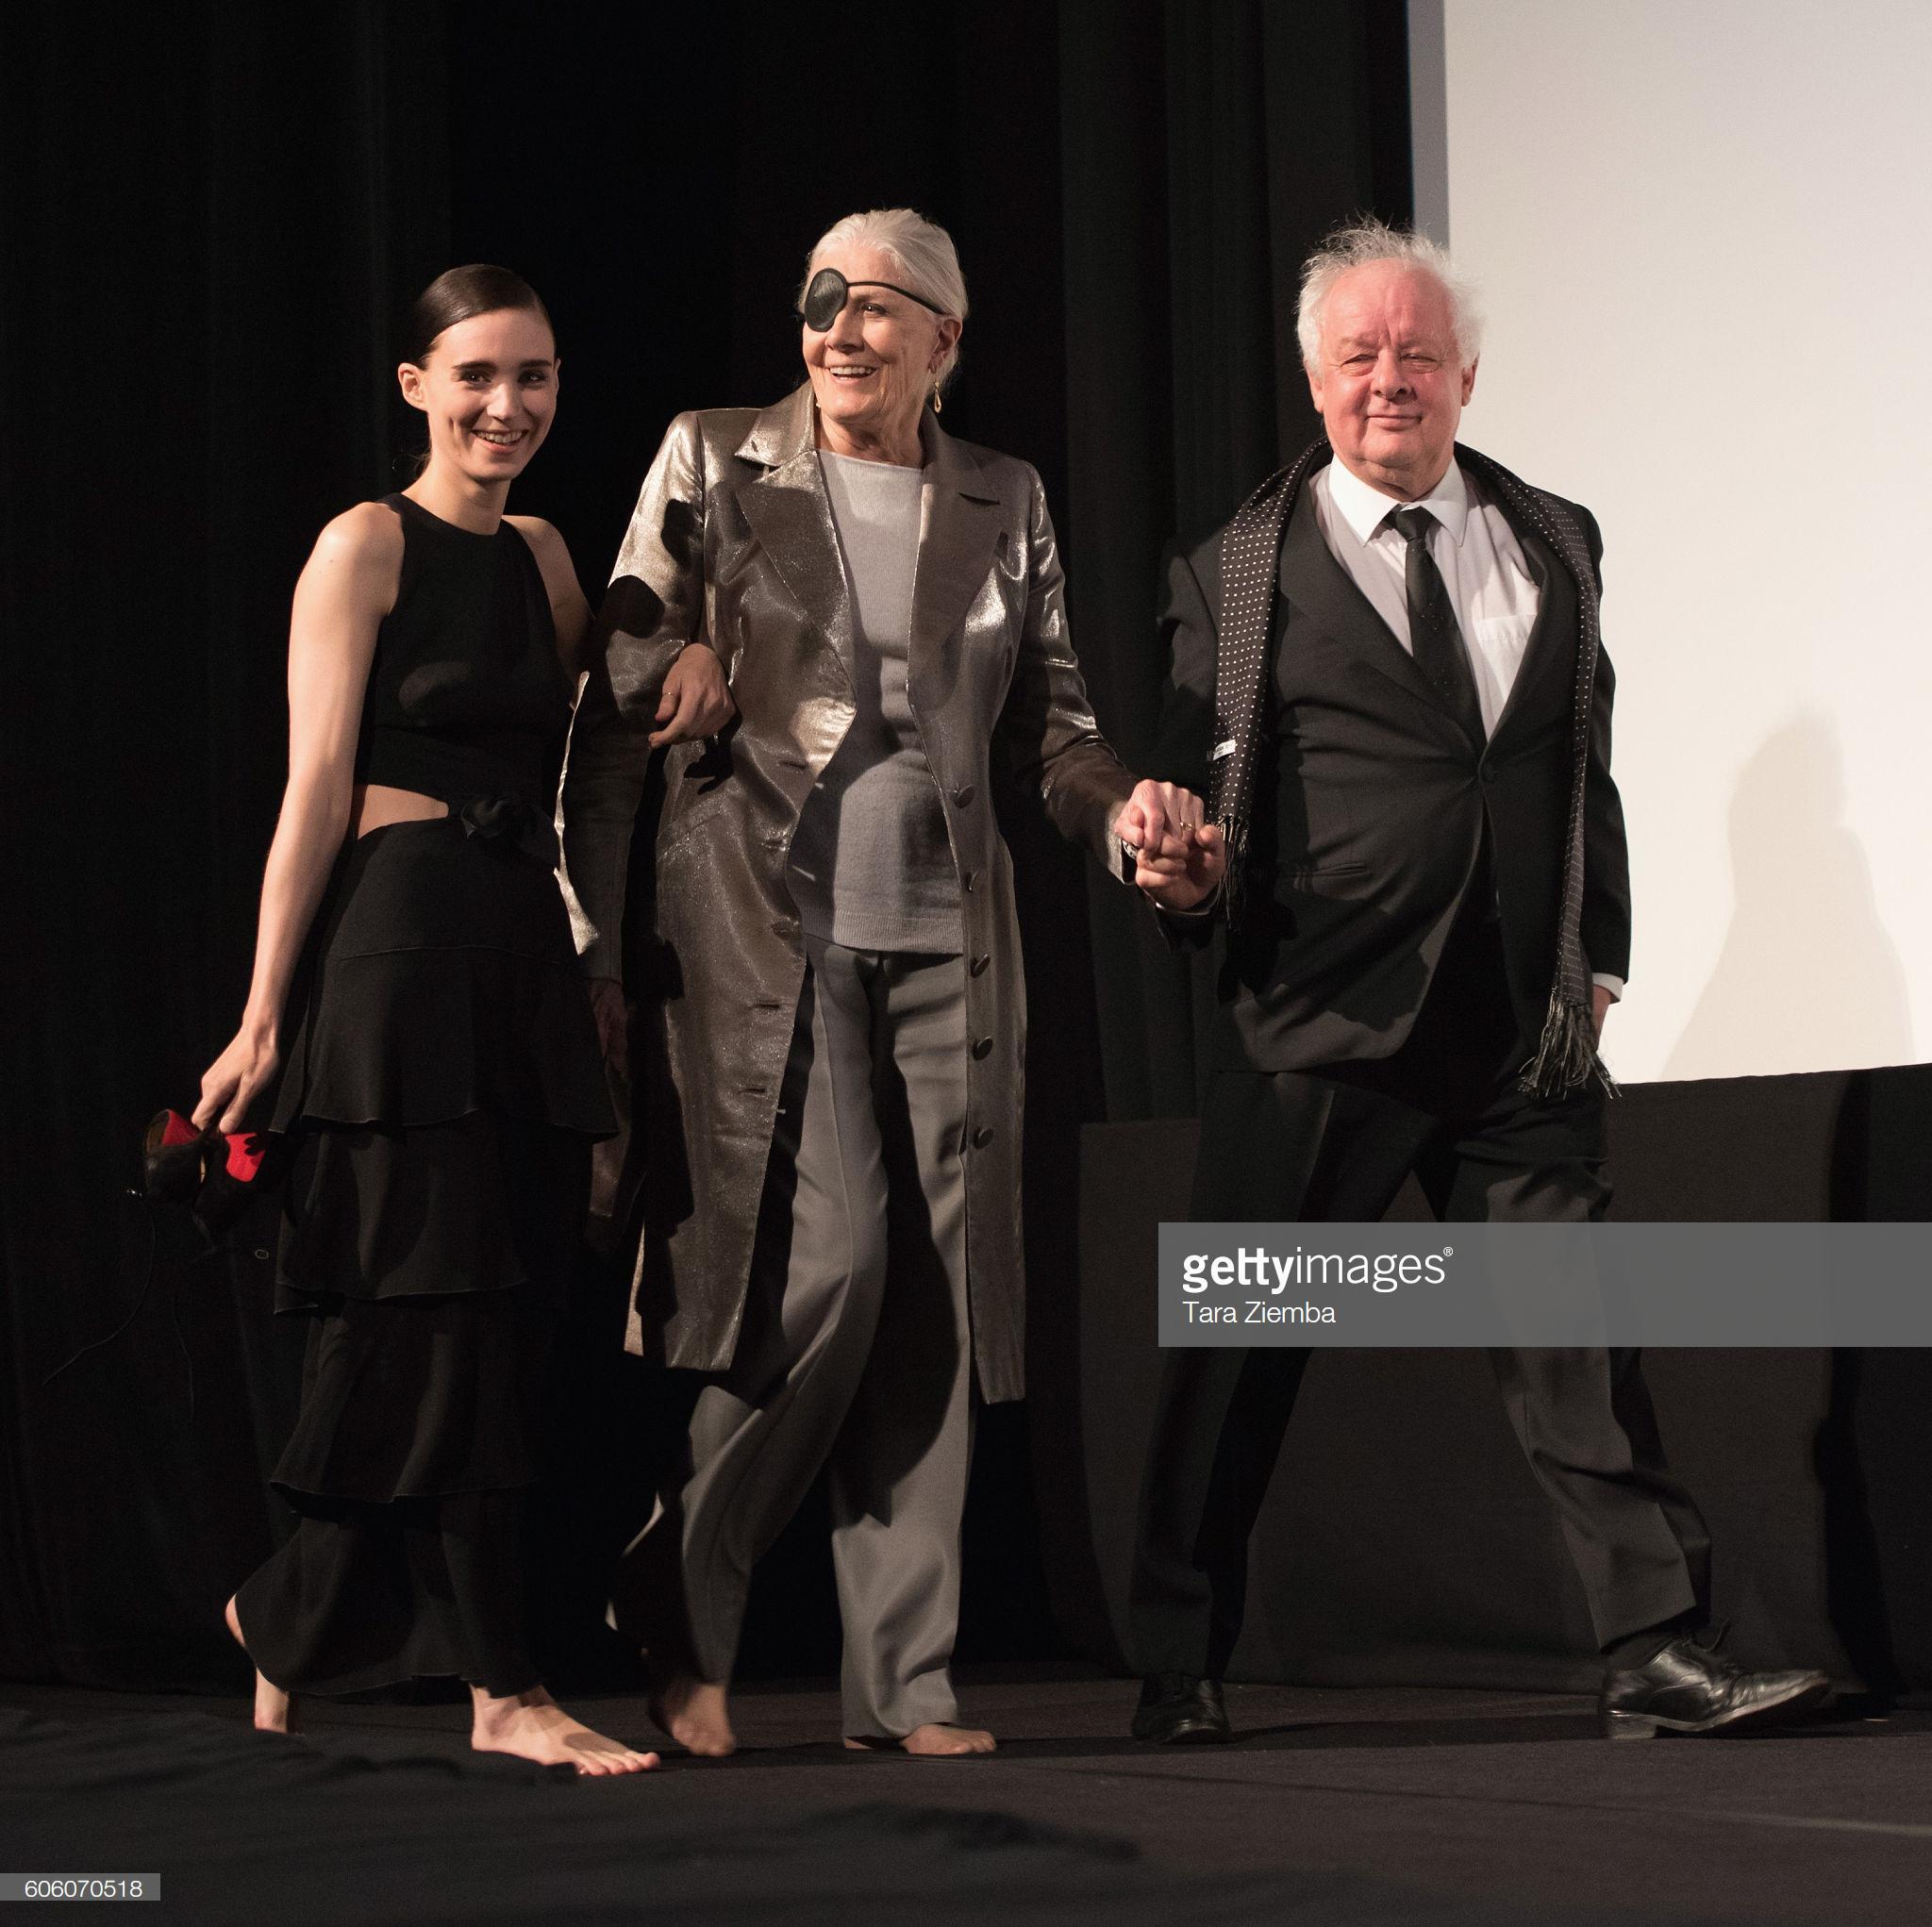 https://pics.wikifeet.com/Rooney-Mara-Feet-4223506.jpg